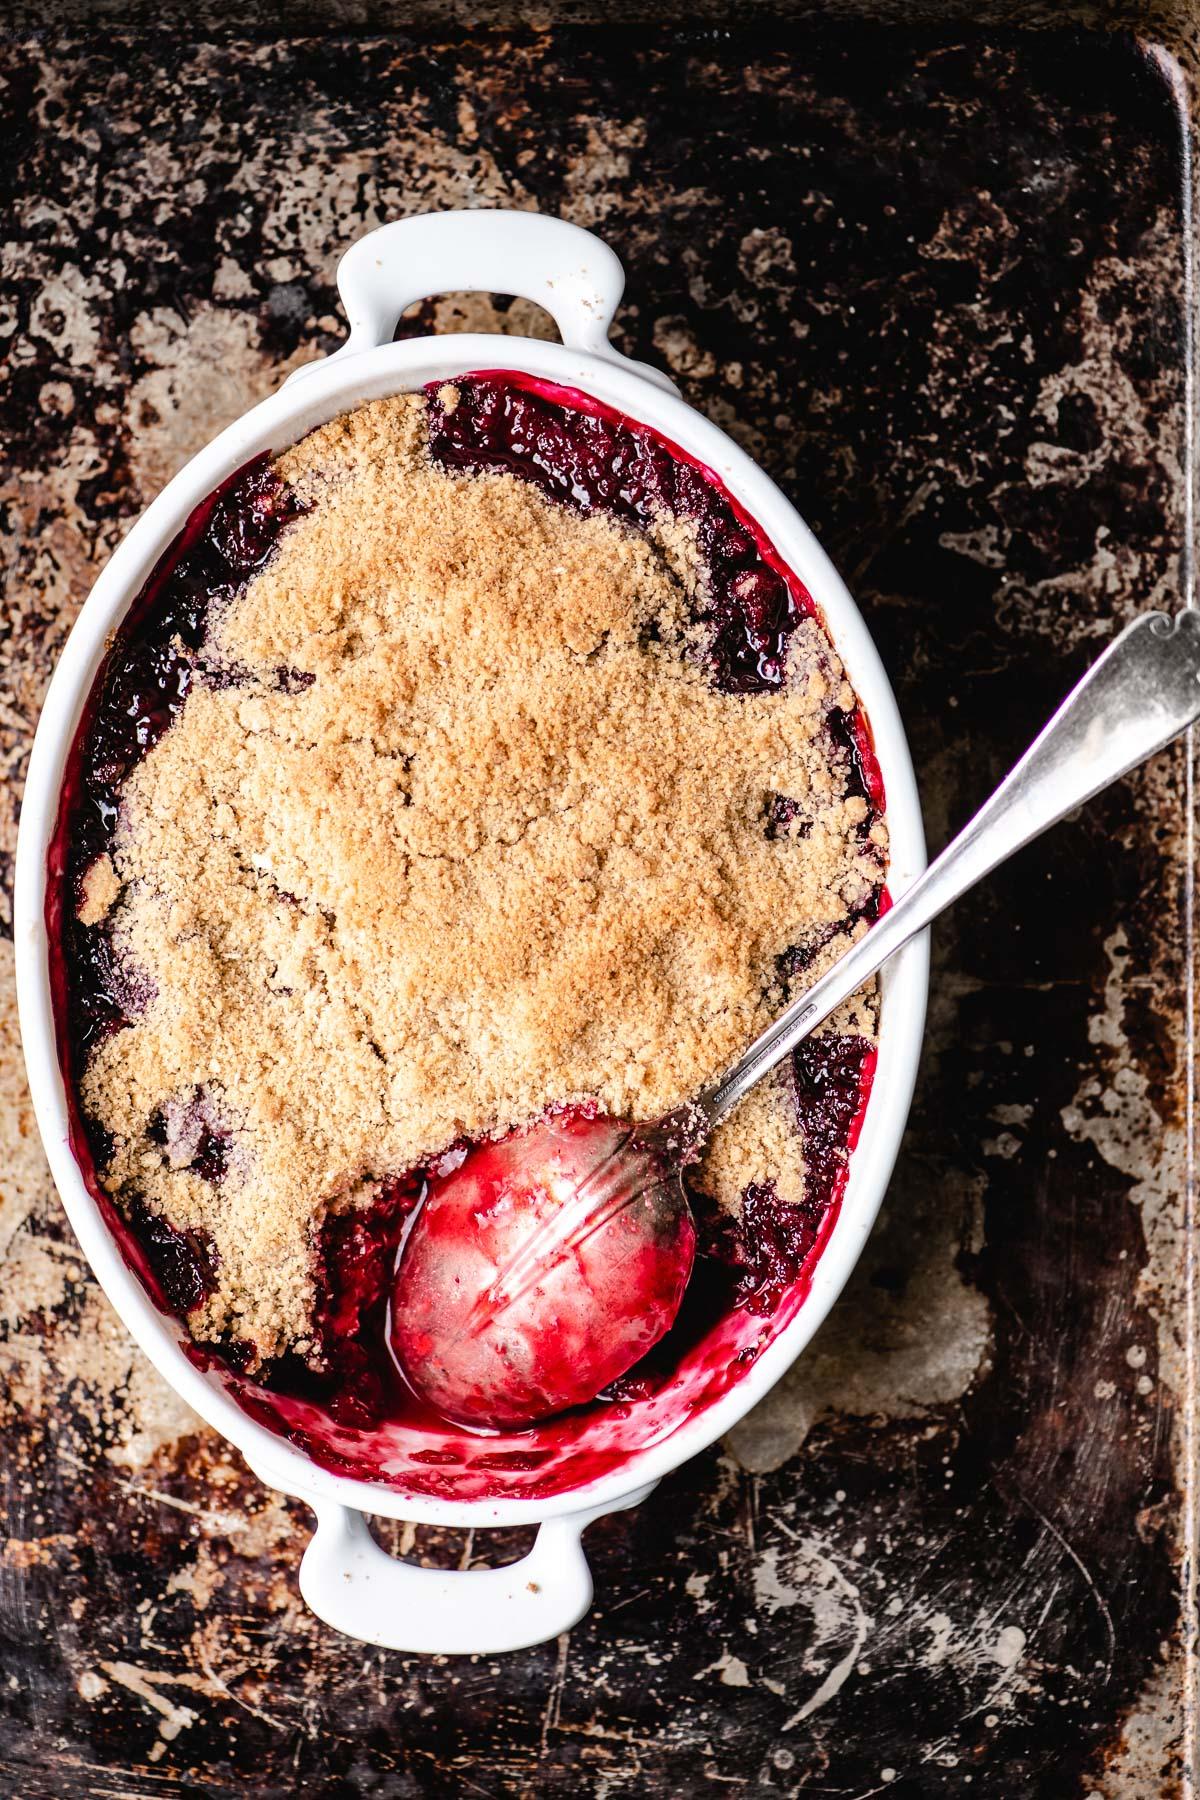 baking a plum crumble